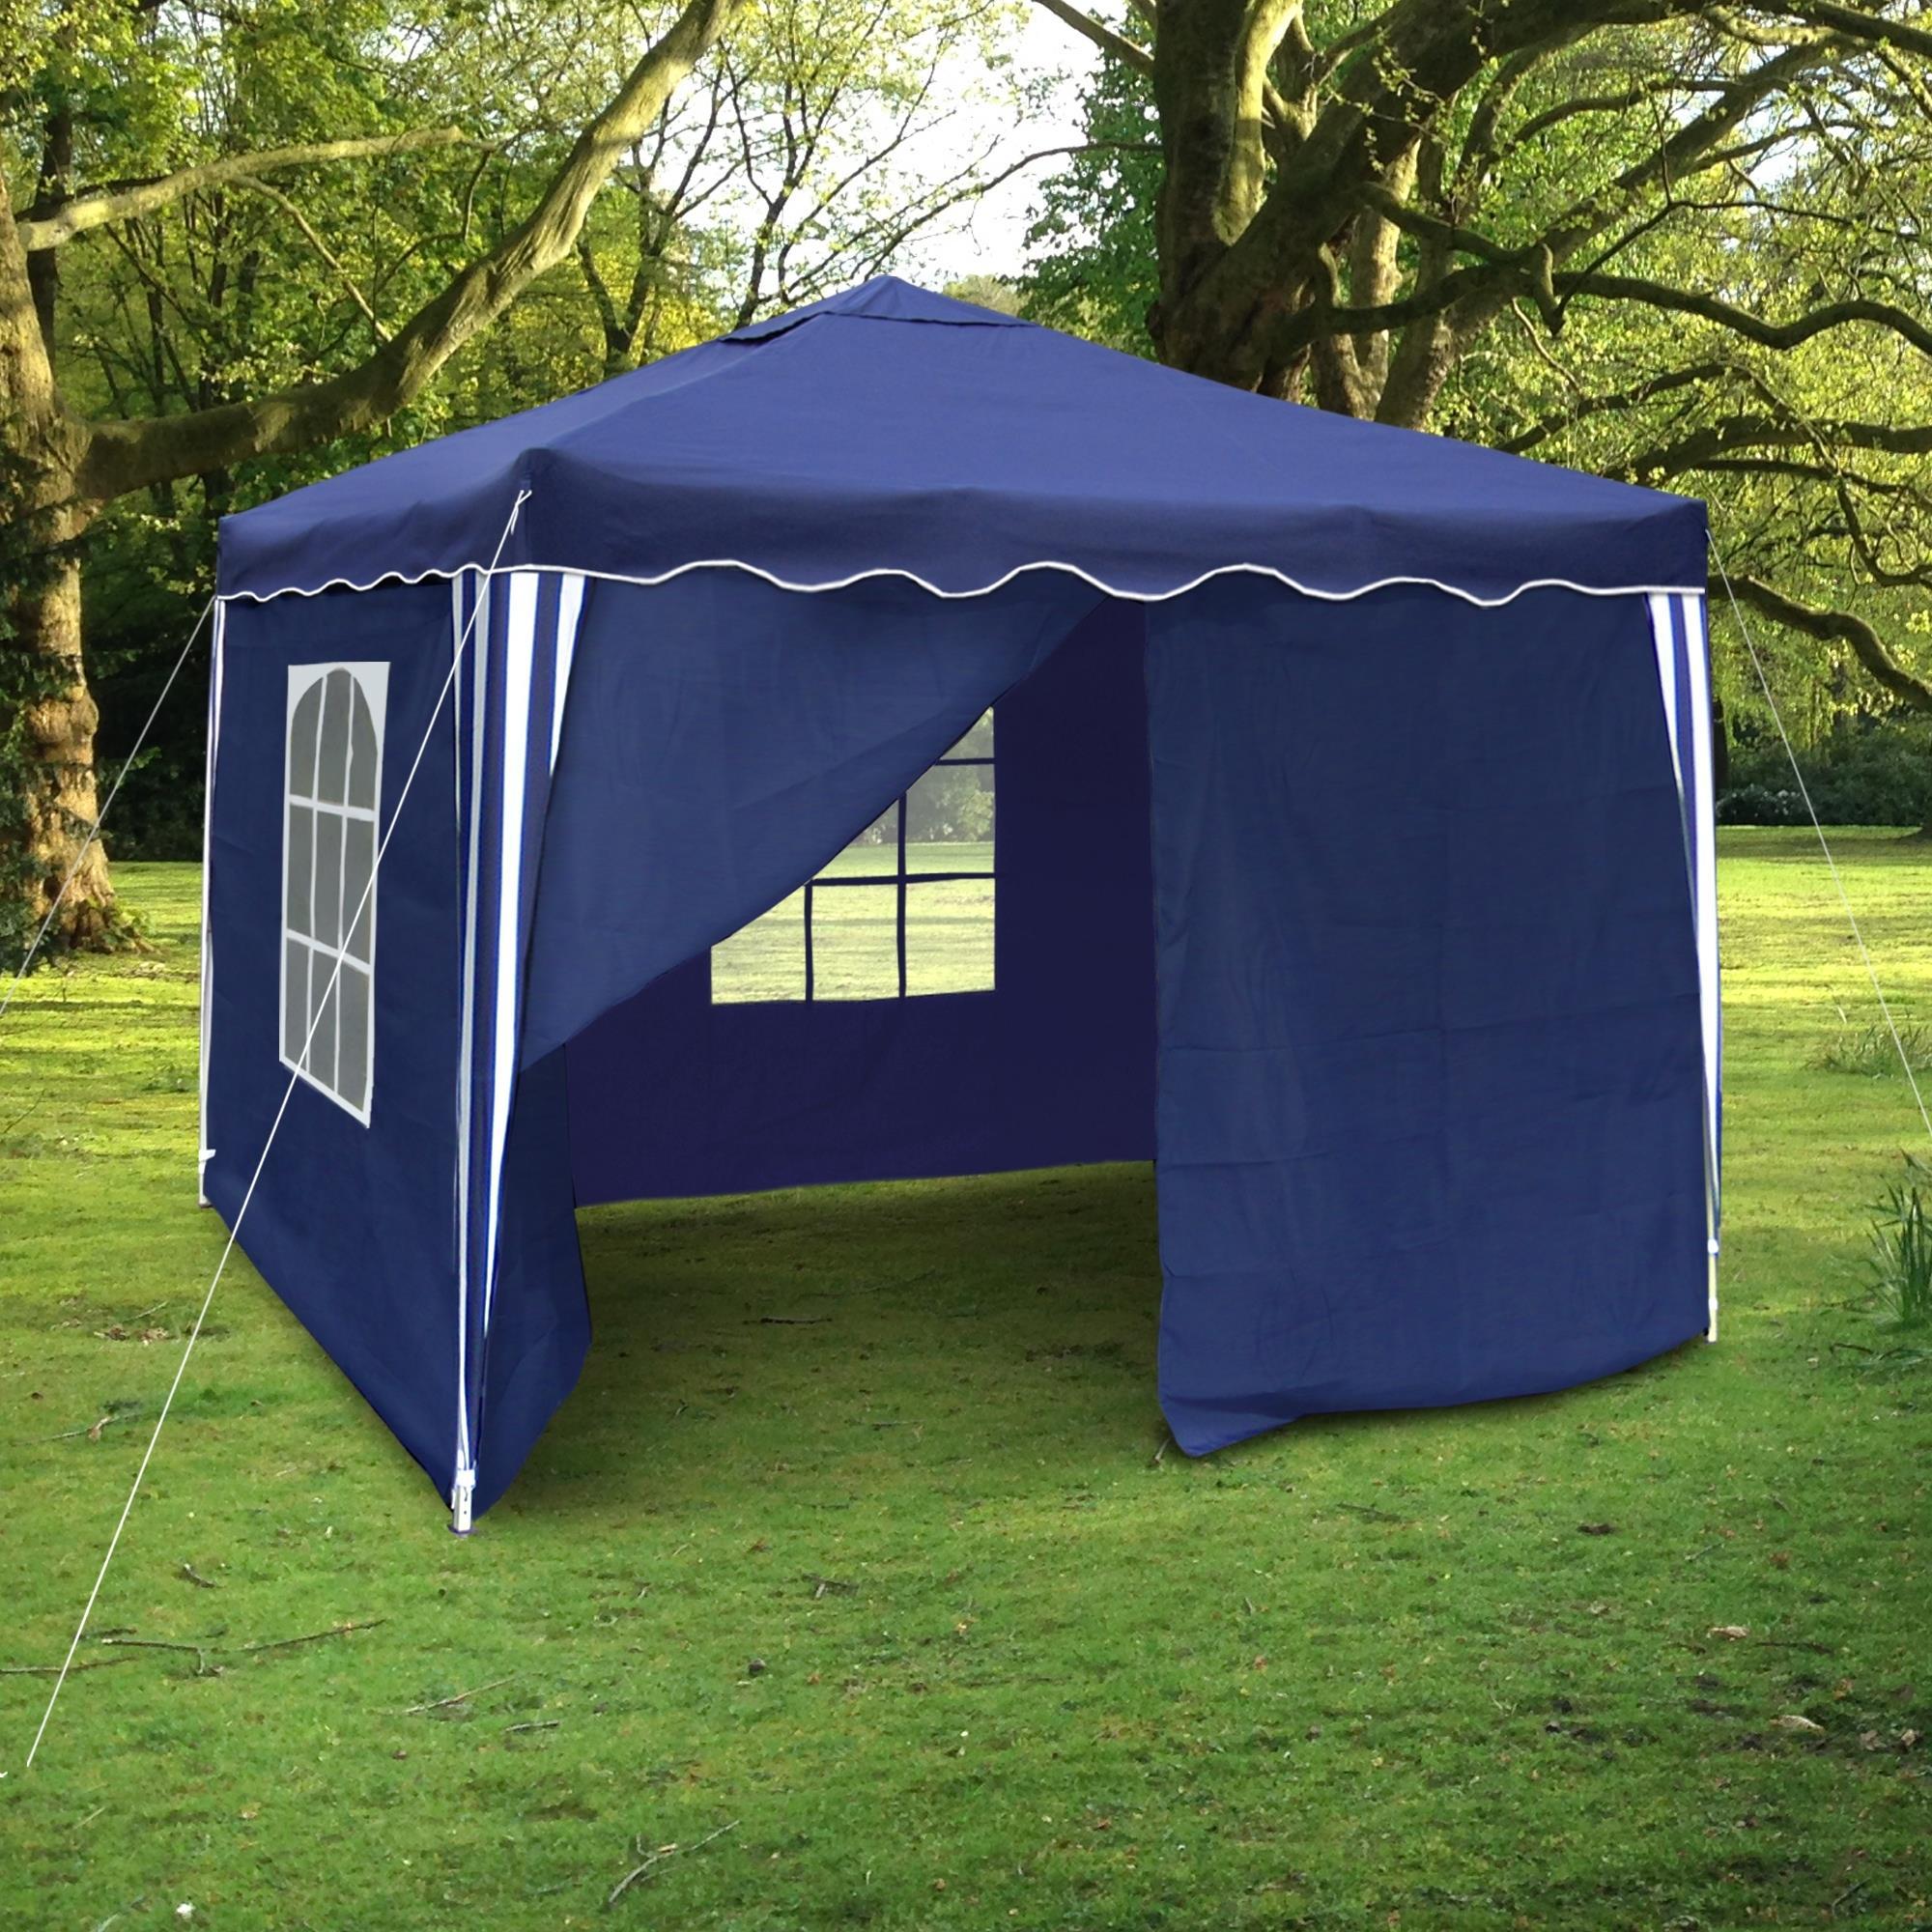 3x3 m falt pavillon garten party bier pavillion zelt blau rot beige schwarz ebay. Black Bedroom Furniture Sets. Home Design Ideas